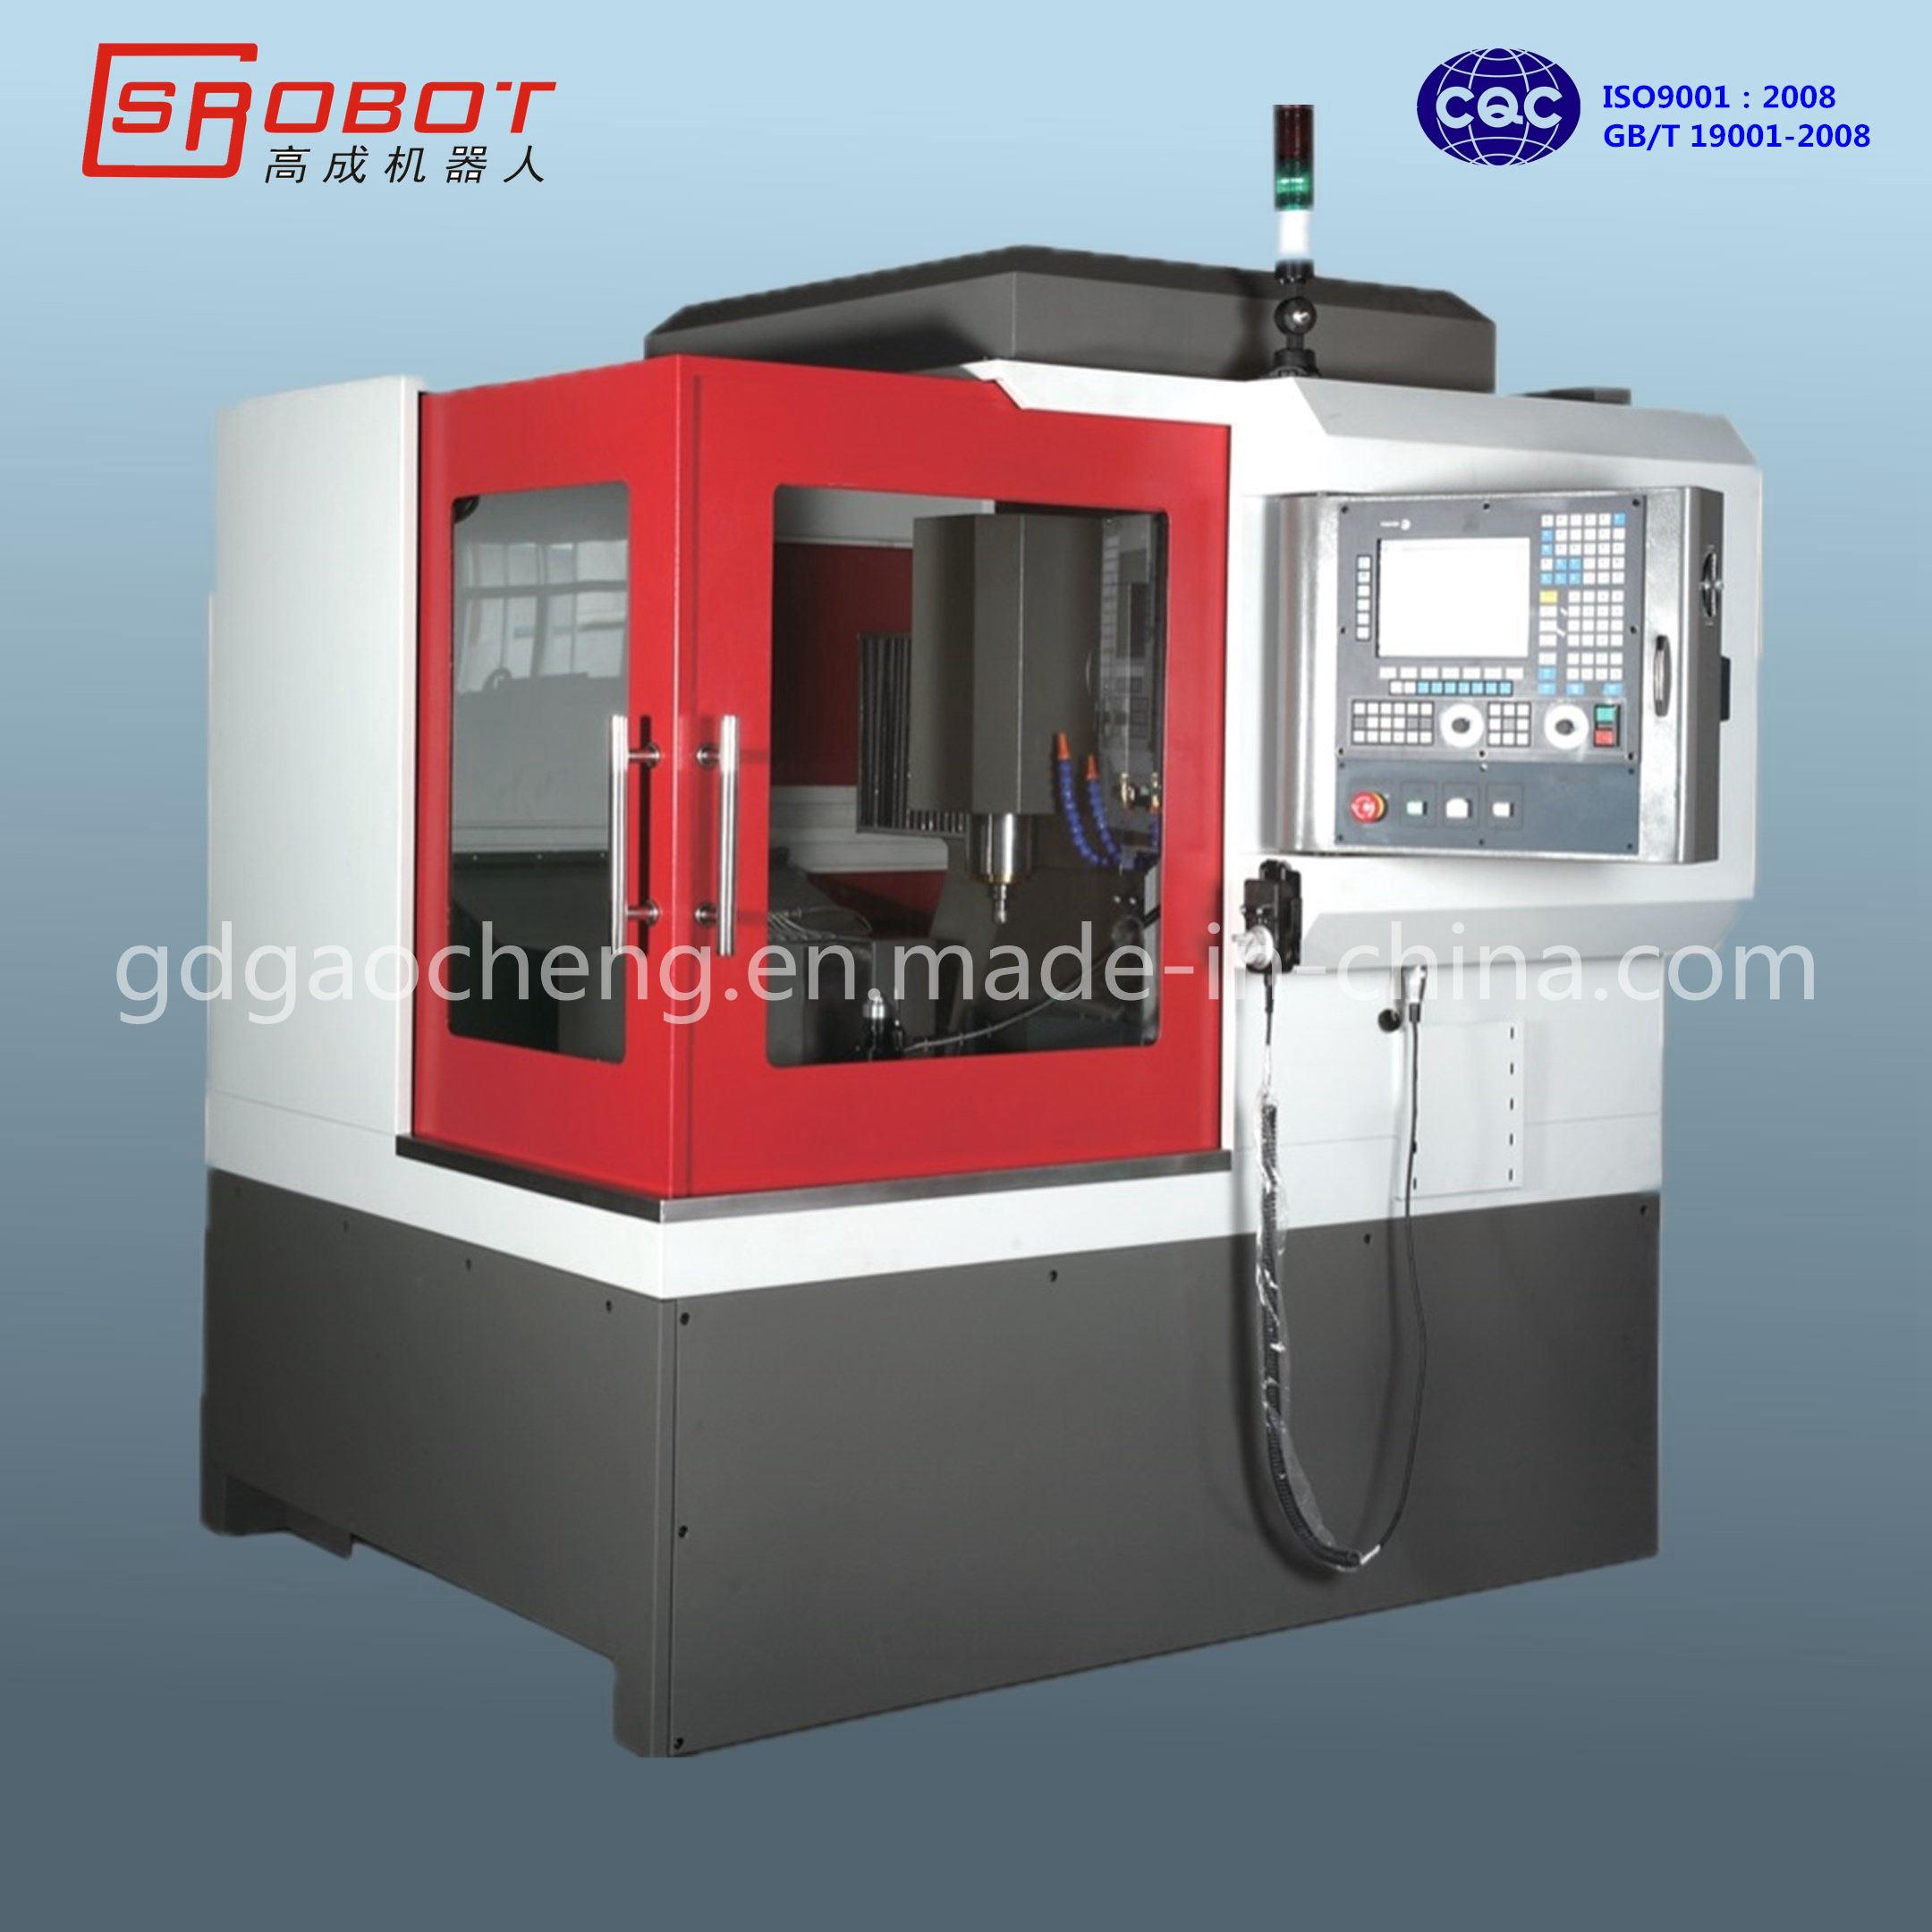 700X800mm CNC Milling & Engraving Machine Model GS-E870